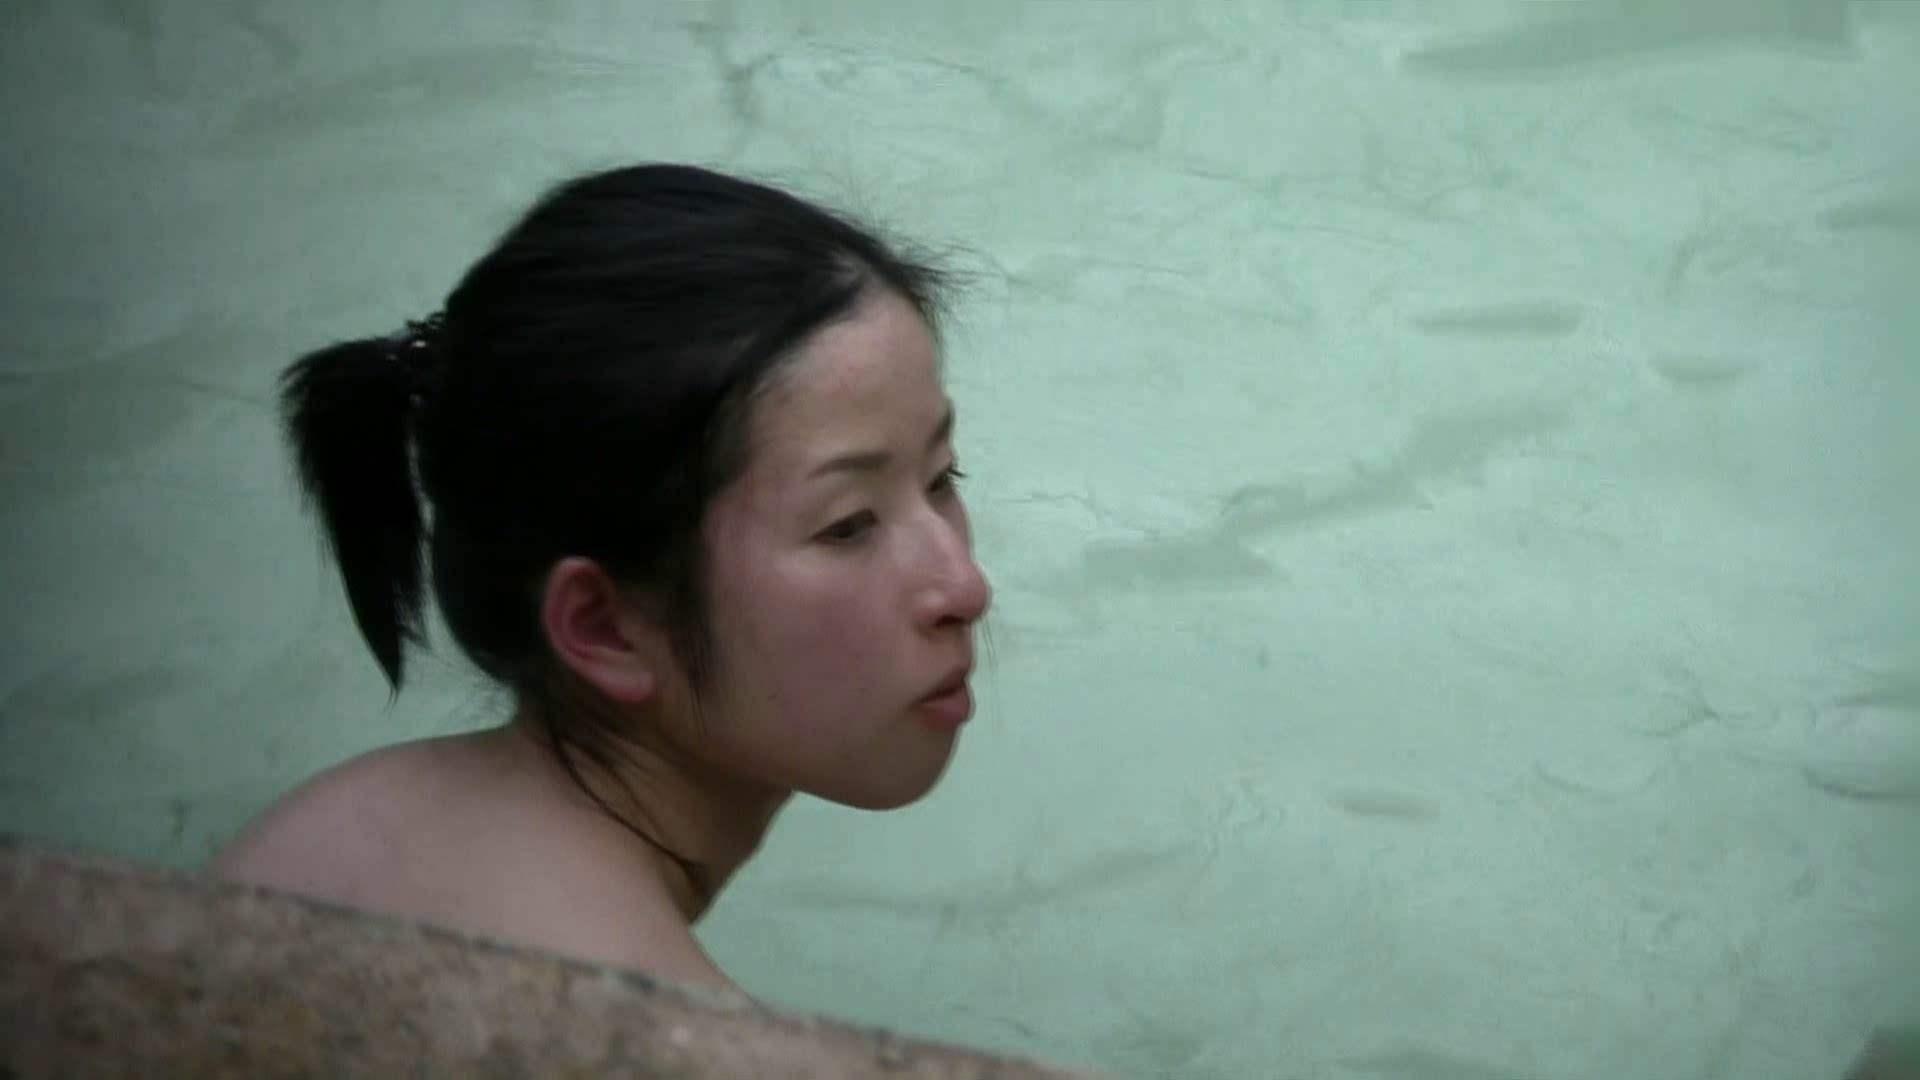 Aquaな露天風呂Vol.656 OLセックス  72画像 30